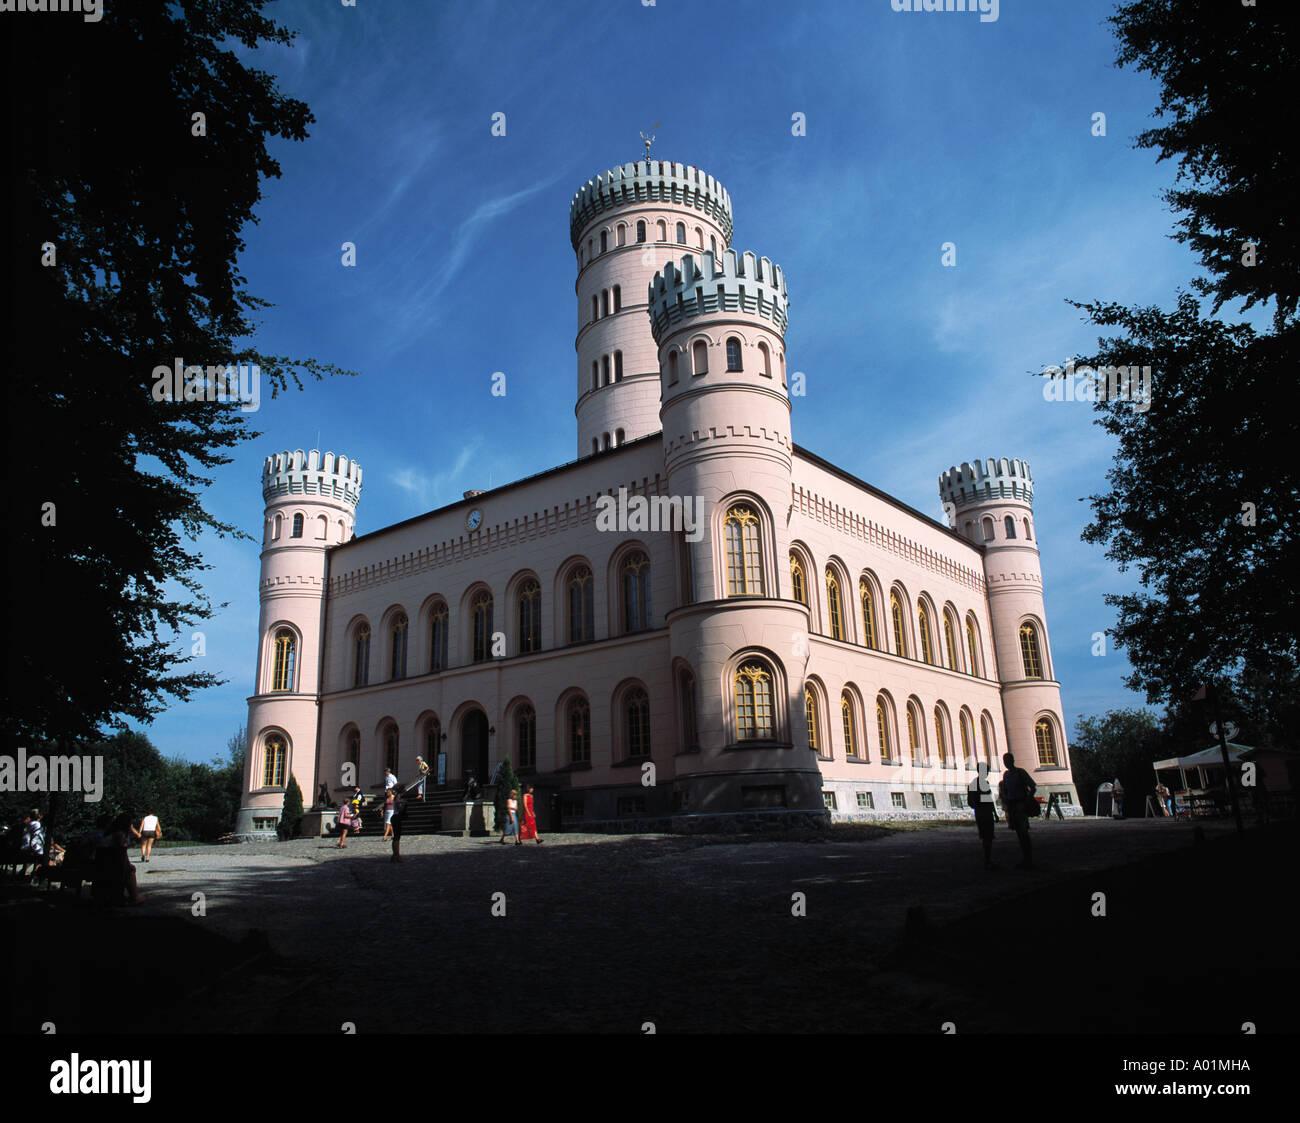 Jagdschloss Granitz auf dem Tempelberg in Lancken-Granitz, Ruegen, Biosphaerenreservat Suedost-Ruegen, Ostsee, Mecklenburg-Vorpommern - Stock Image